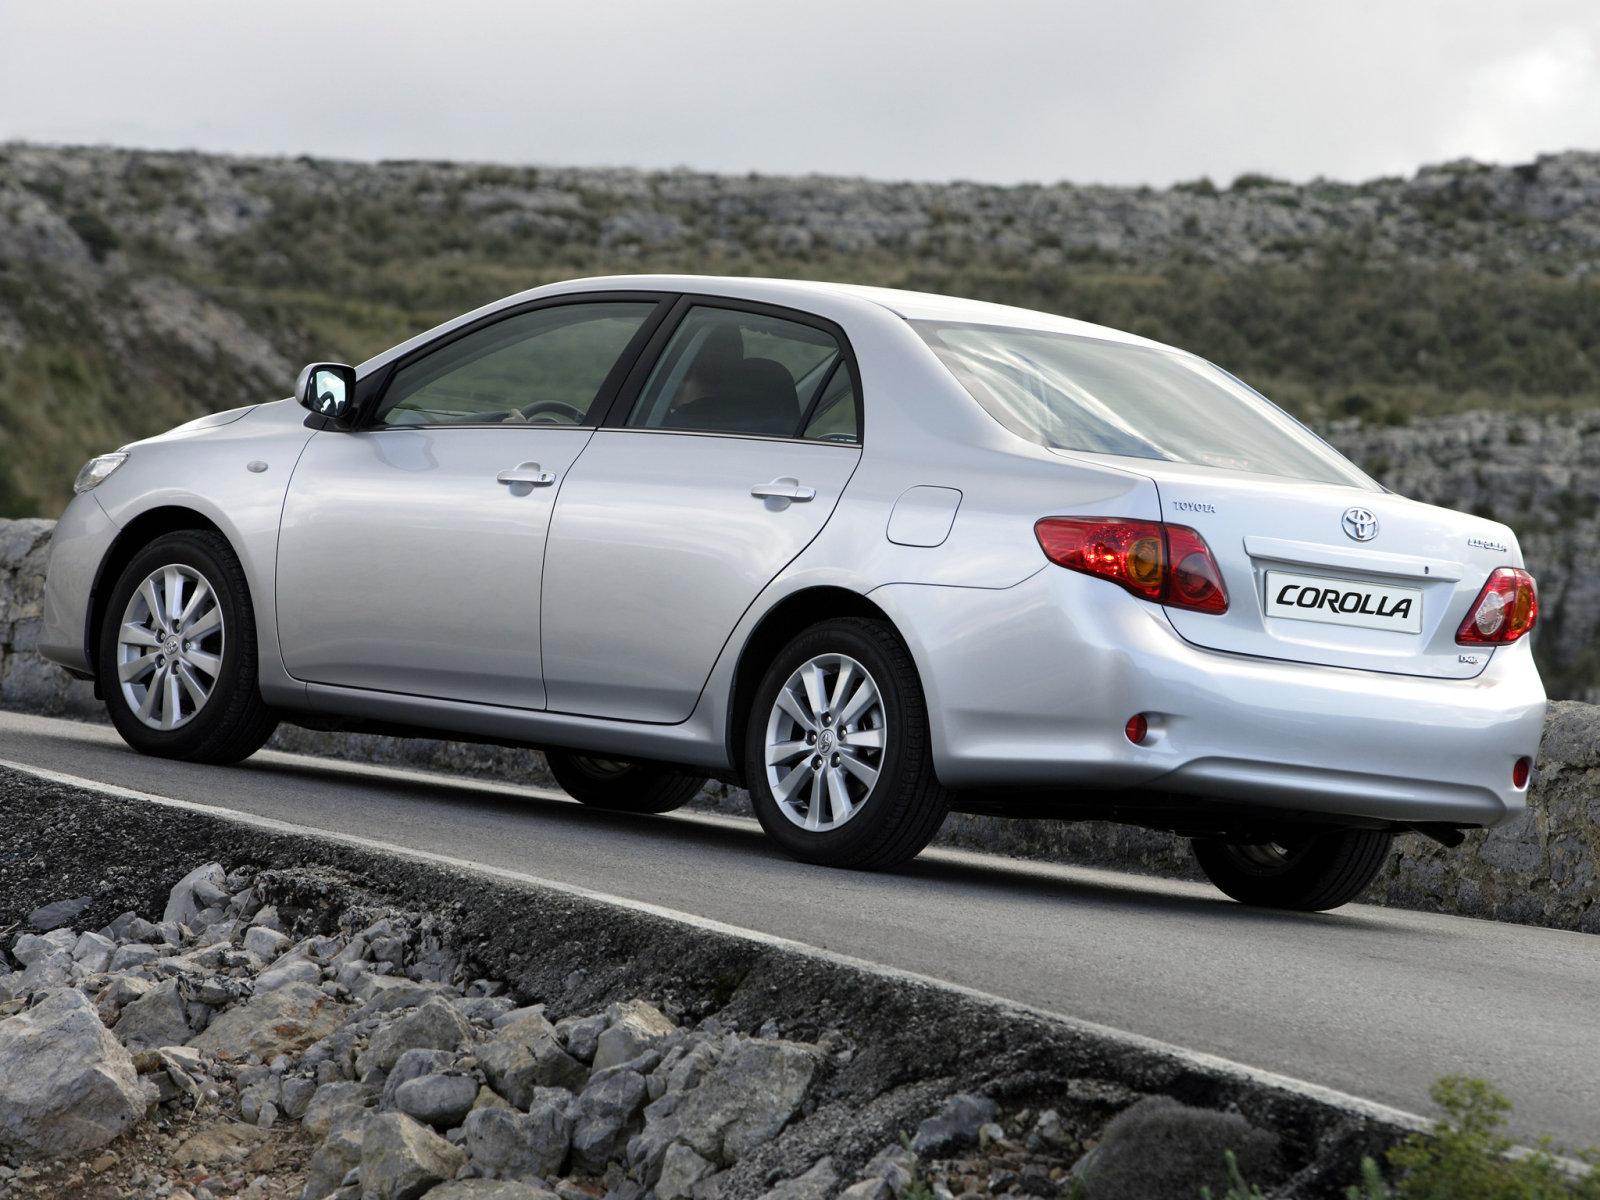 Toyota corolla своими руками фото